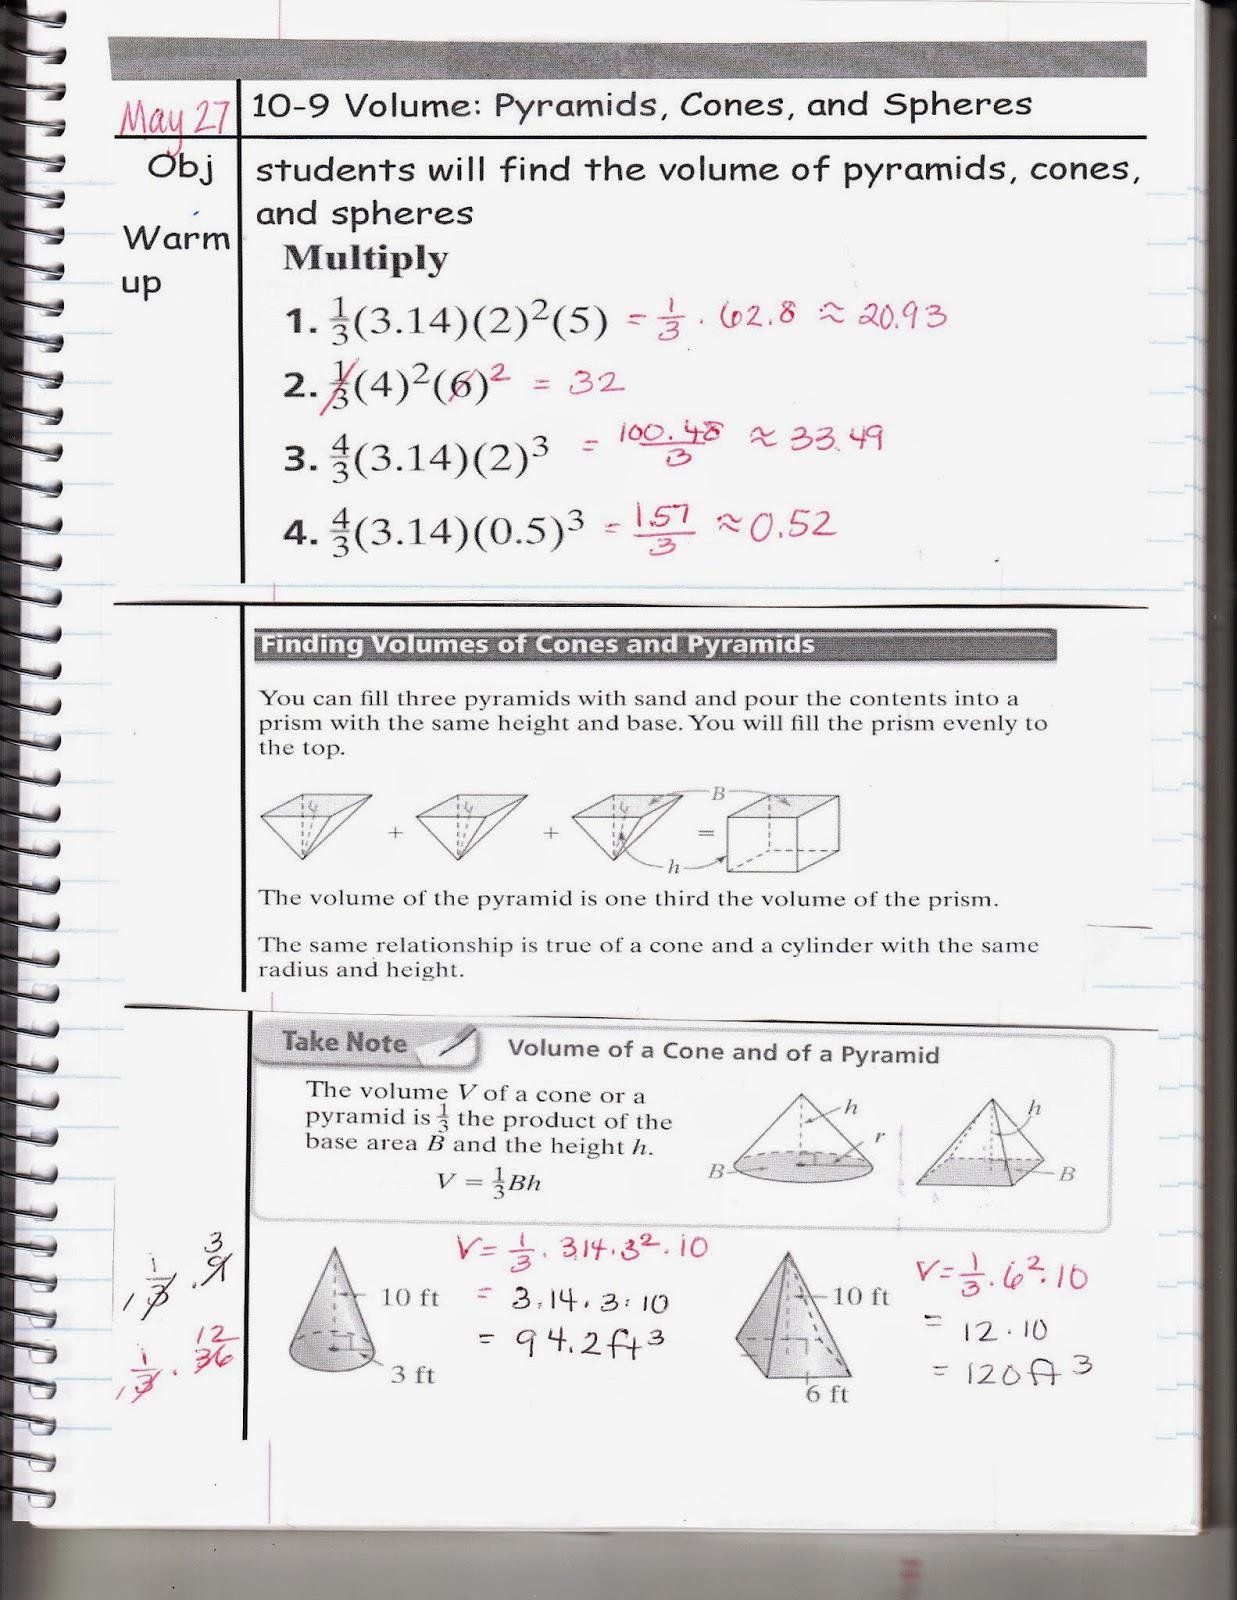 Ms Jean S Classroom Blog 10 9 Volume Pyramids Cones